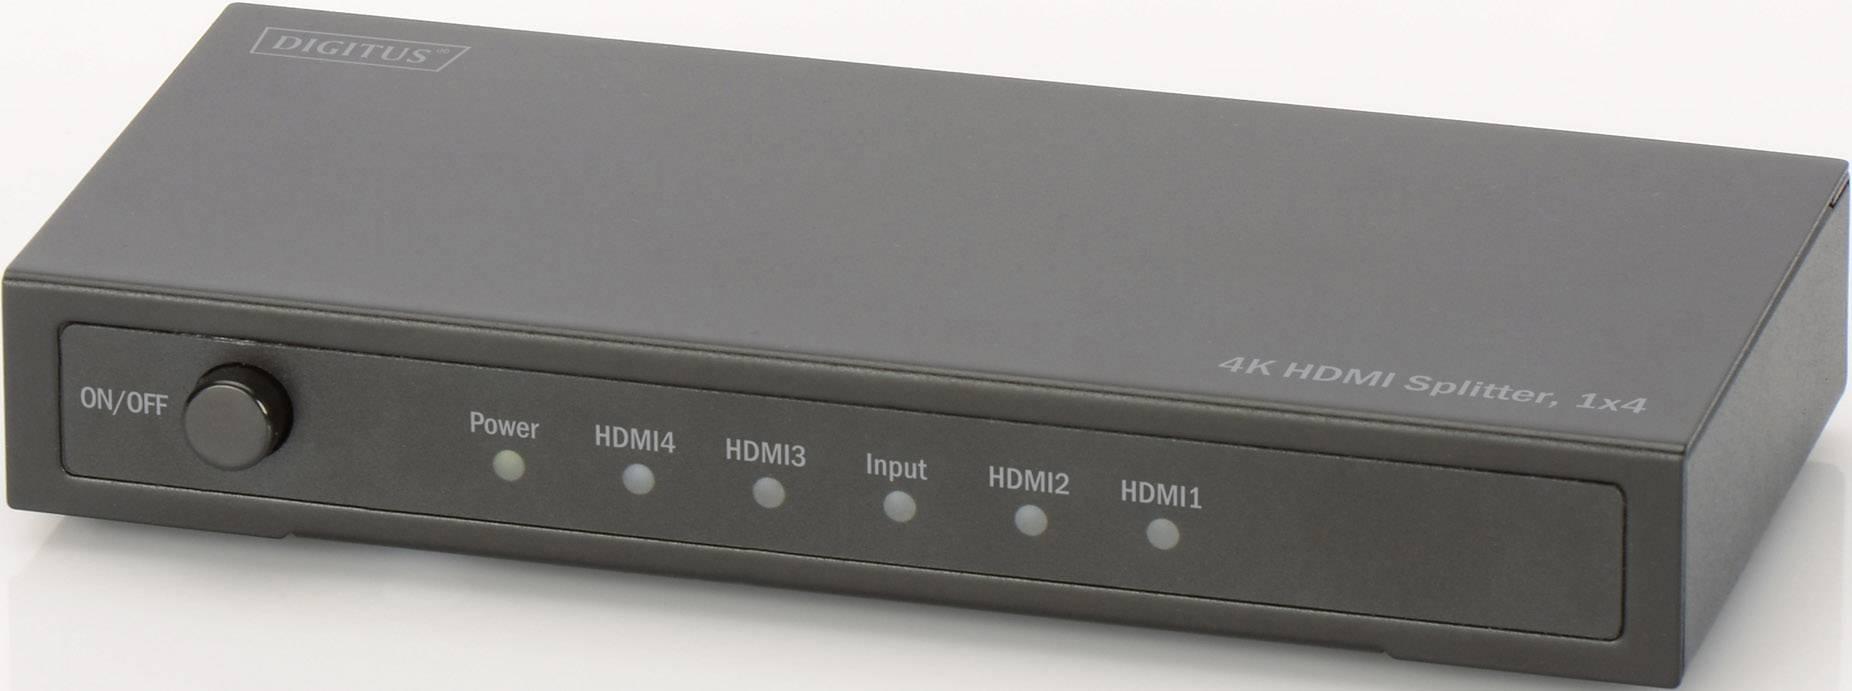 Digitus DS-47304 4 ports HDMI splitter 3D playback mode